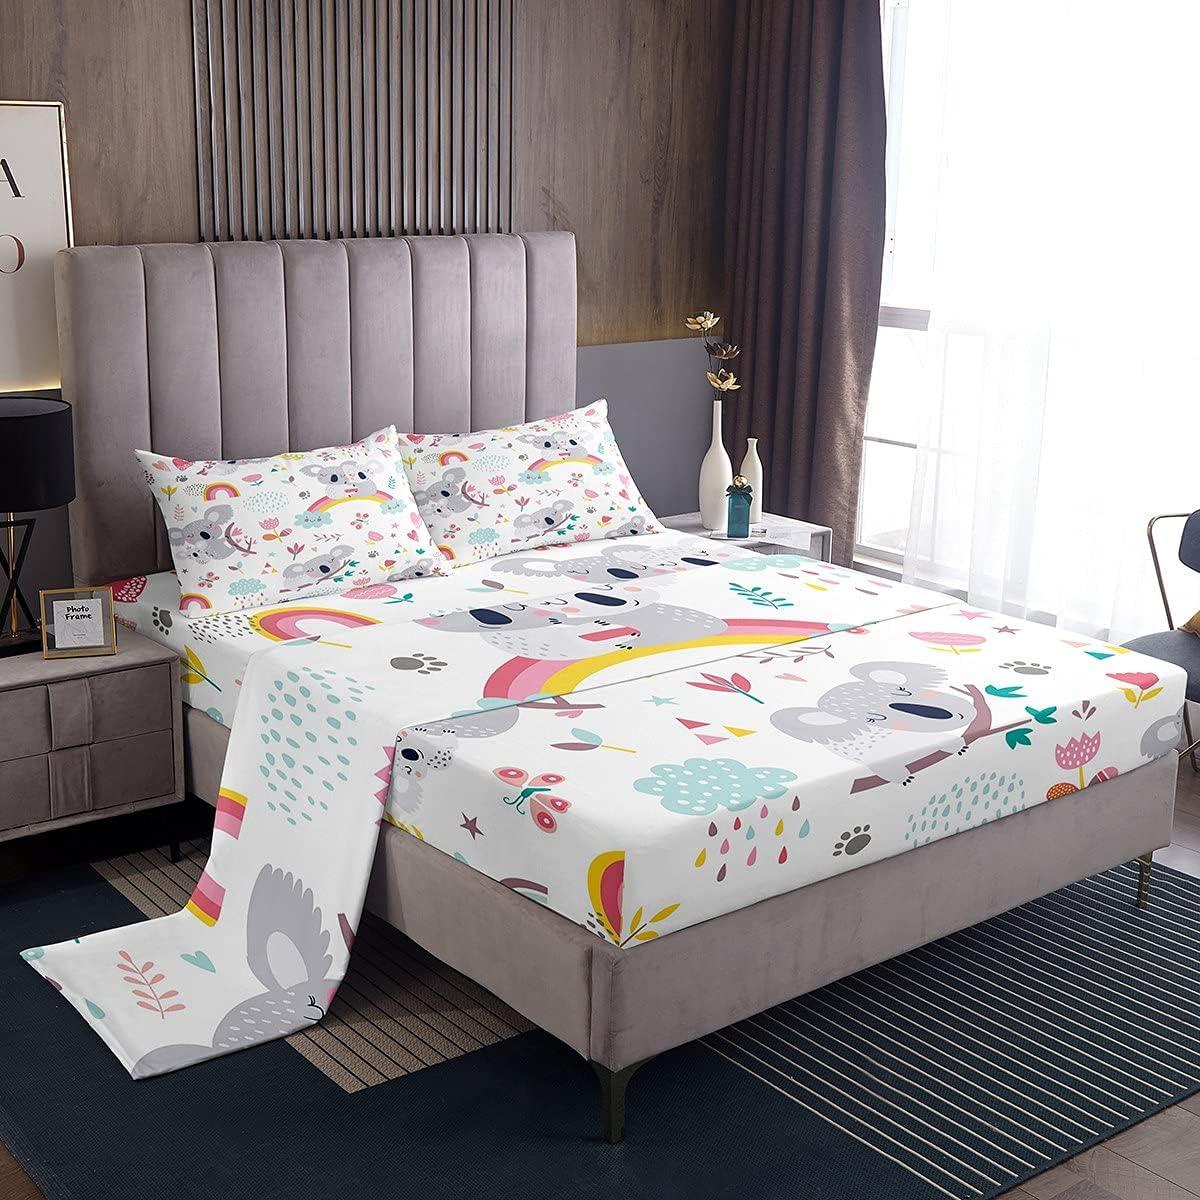 Feelyou Kids Bed Sheet Twin Koala Cute Rapid rise Bargain sale Set Anima Sheets Children